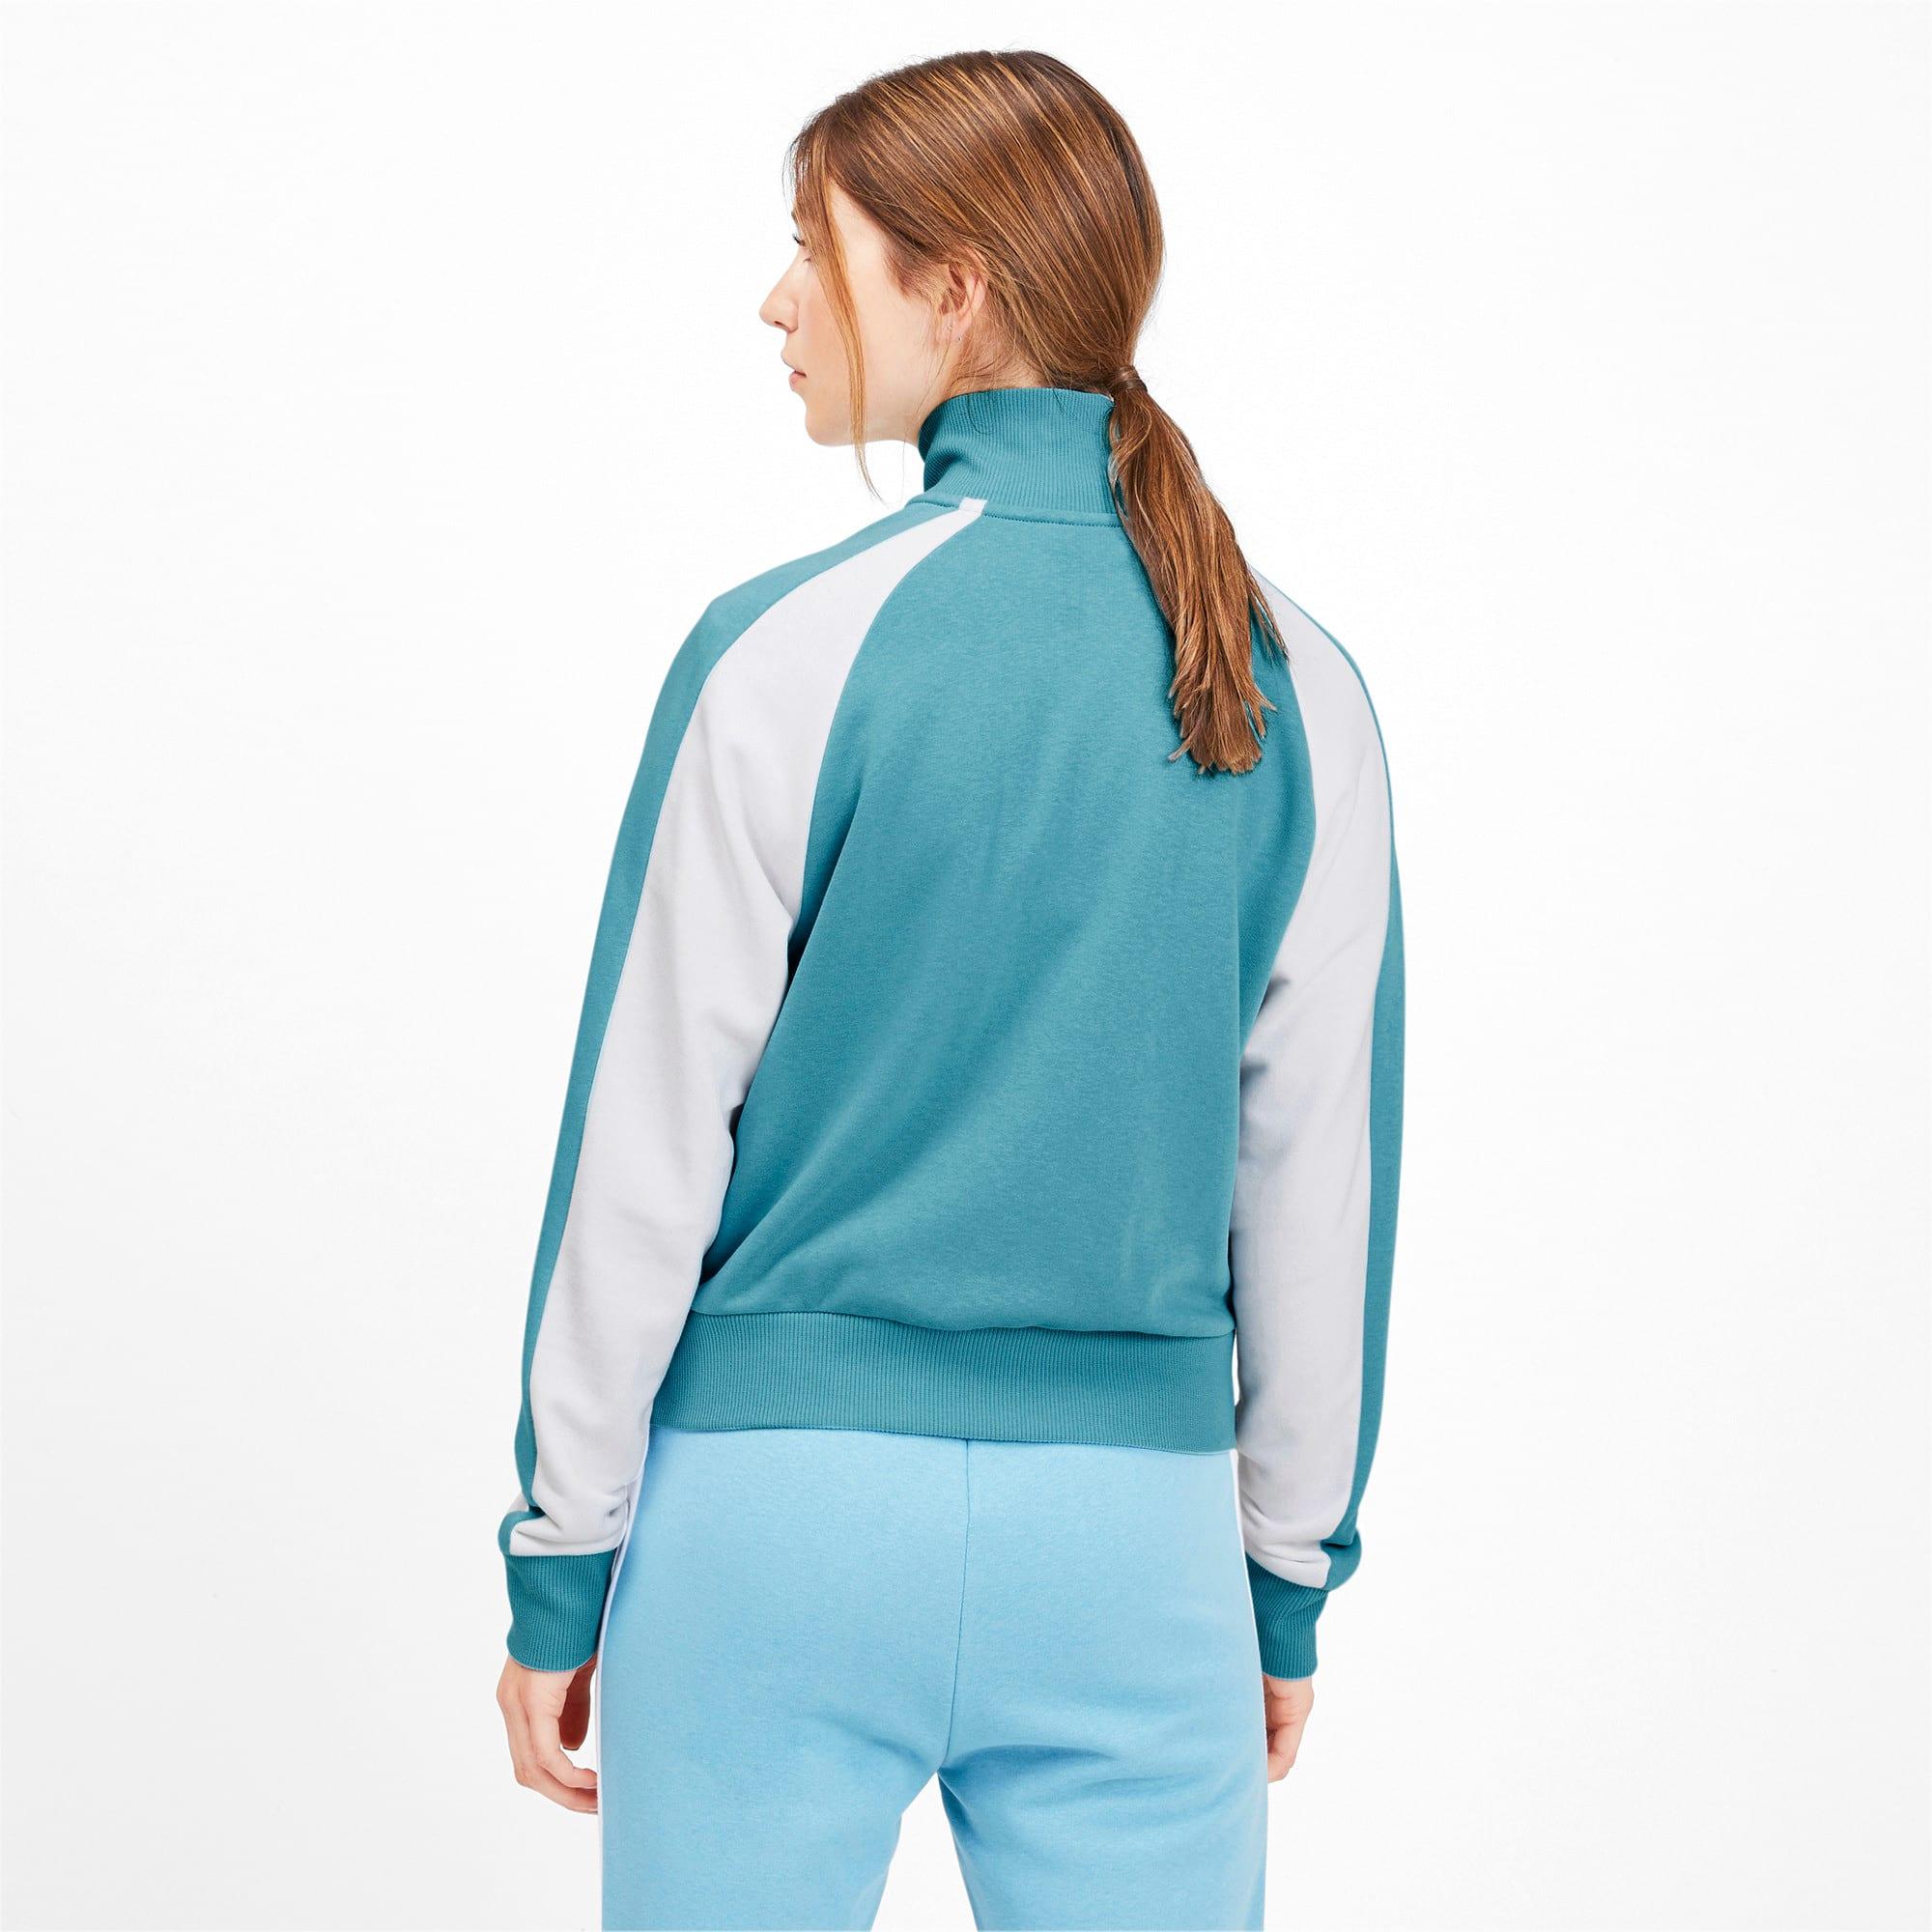 Miniatura 3 de Chaqueta deportiva Classics T7 para mujer, Milky Blue, mediano